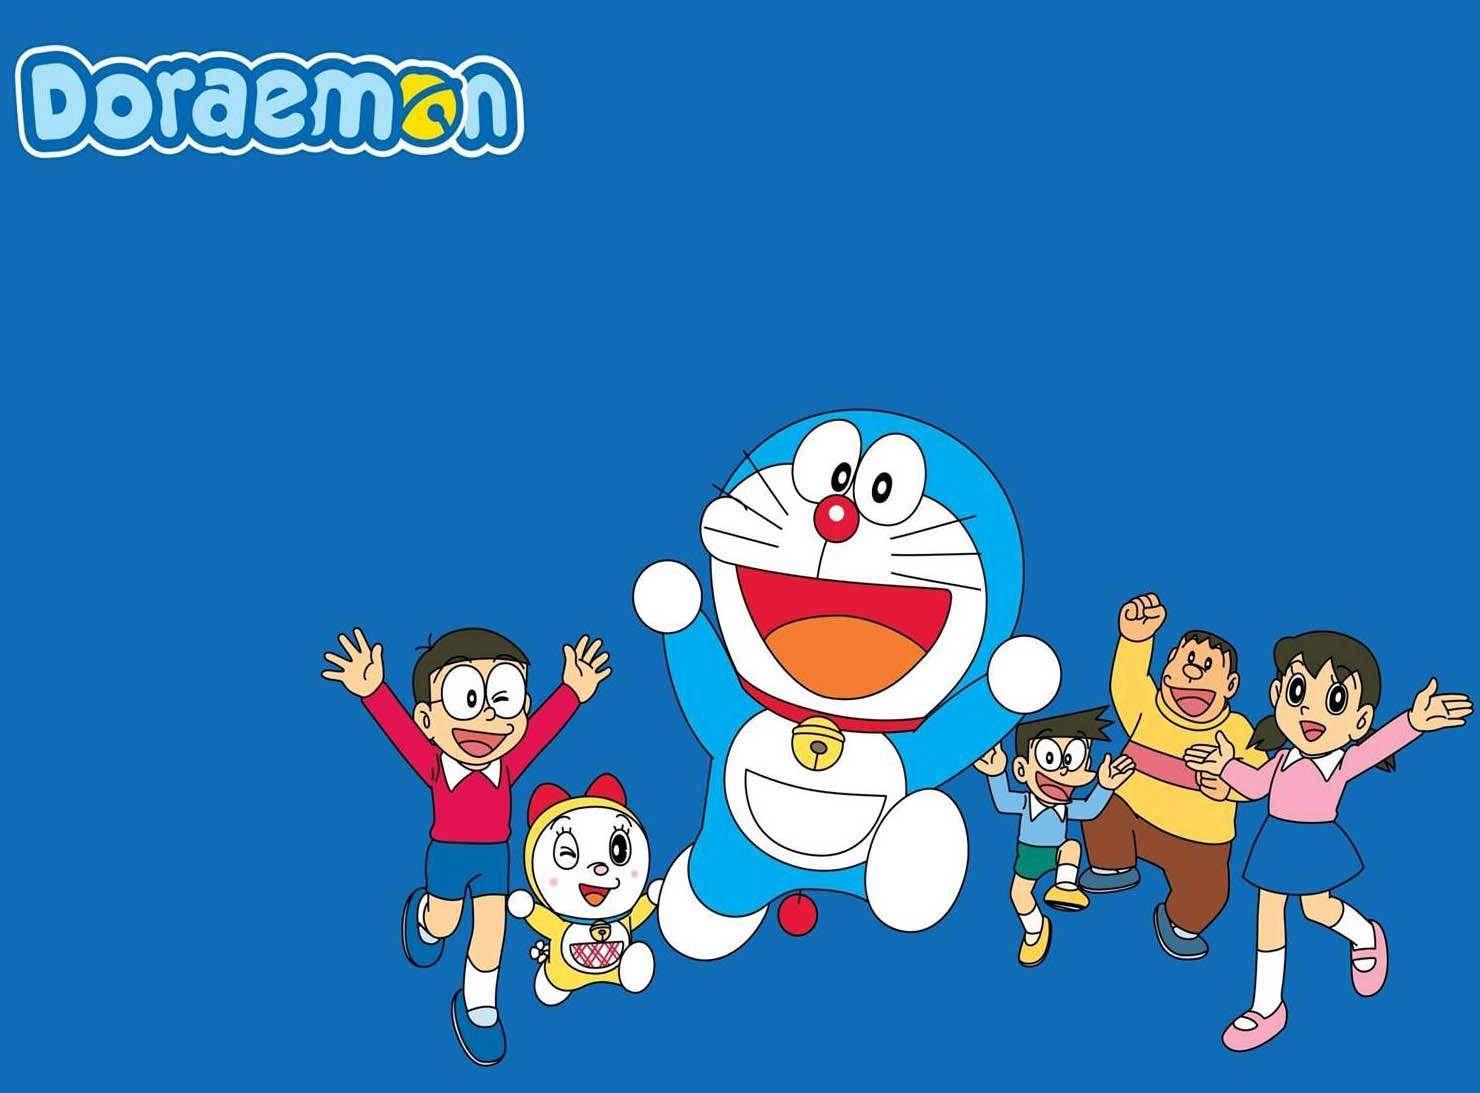 Doraemon Phone Wallpaper Hd Doraemon Wallpapers Cartoon Hd Doraemon Wallpapers 22917 Doremon Cartoon Latest Hd Wa Wallpaper Kartun Hd Kartun Wallpaper Kartun